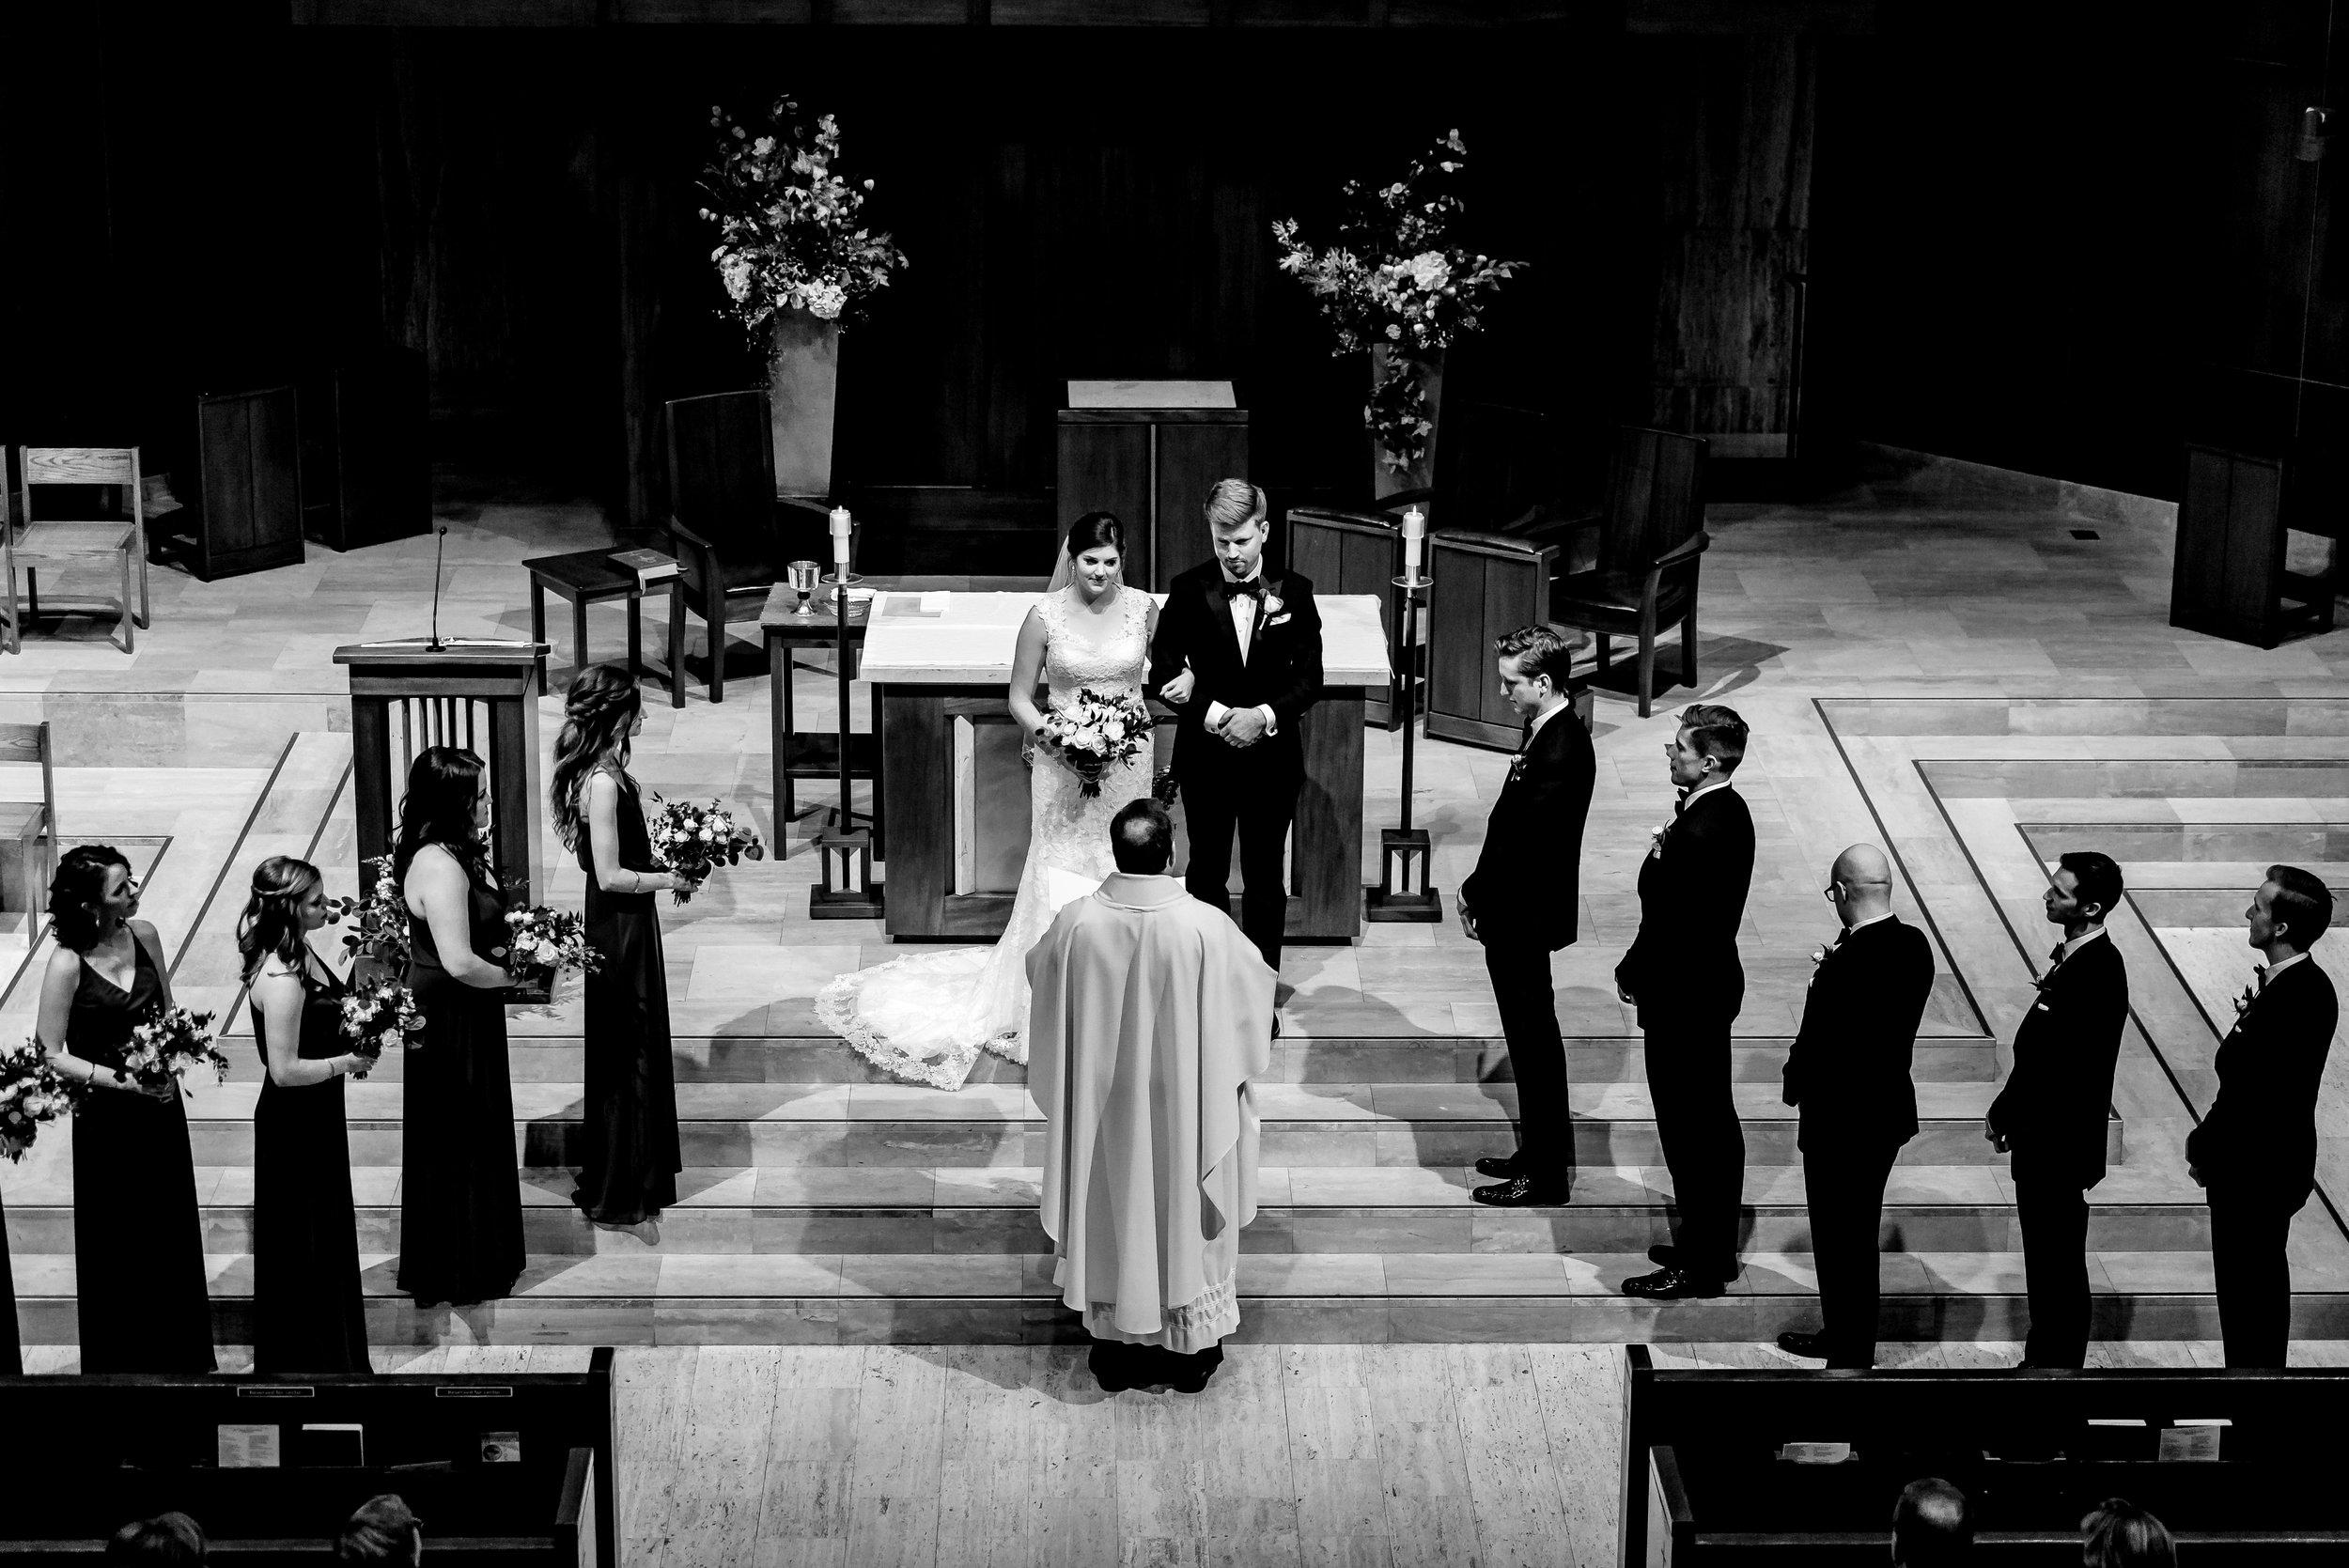 Lauren and Karl - Van Dusen Mansion Wedding and St. Olaf Catholic Church Minneapolis Wedding BW-229.jpg